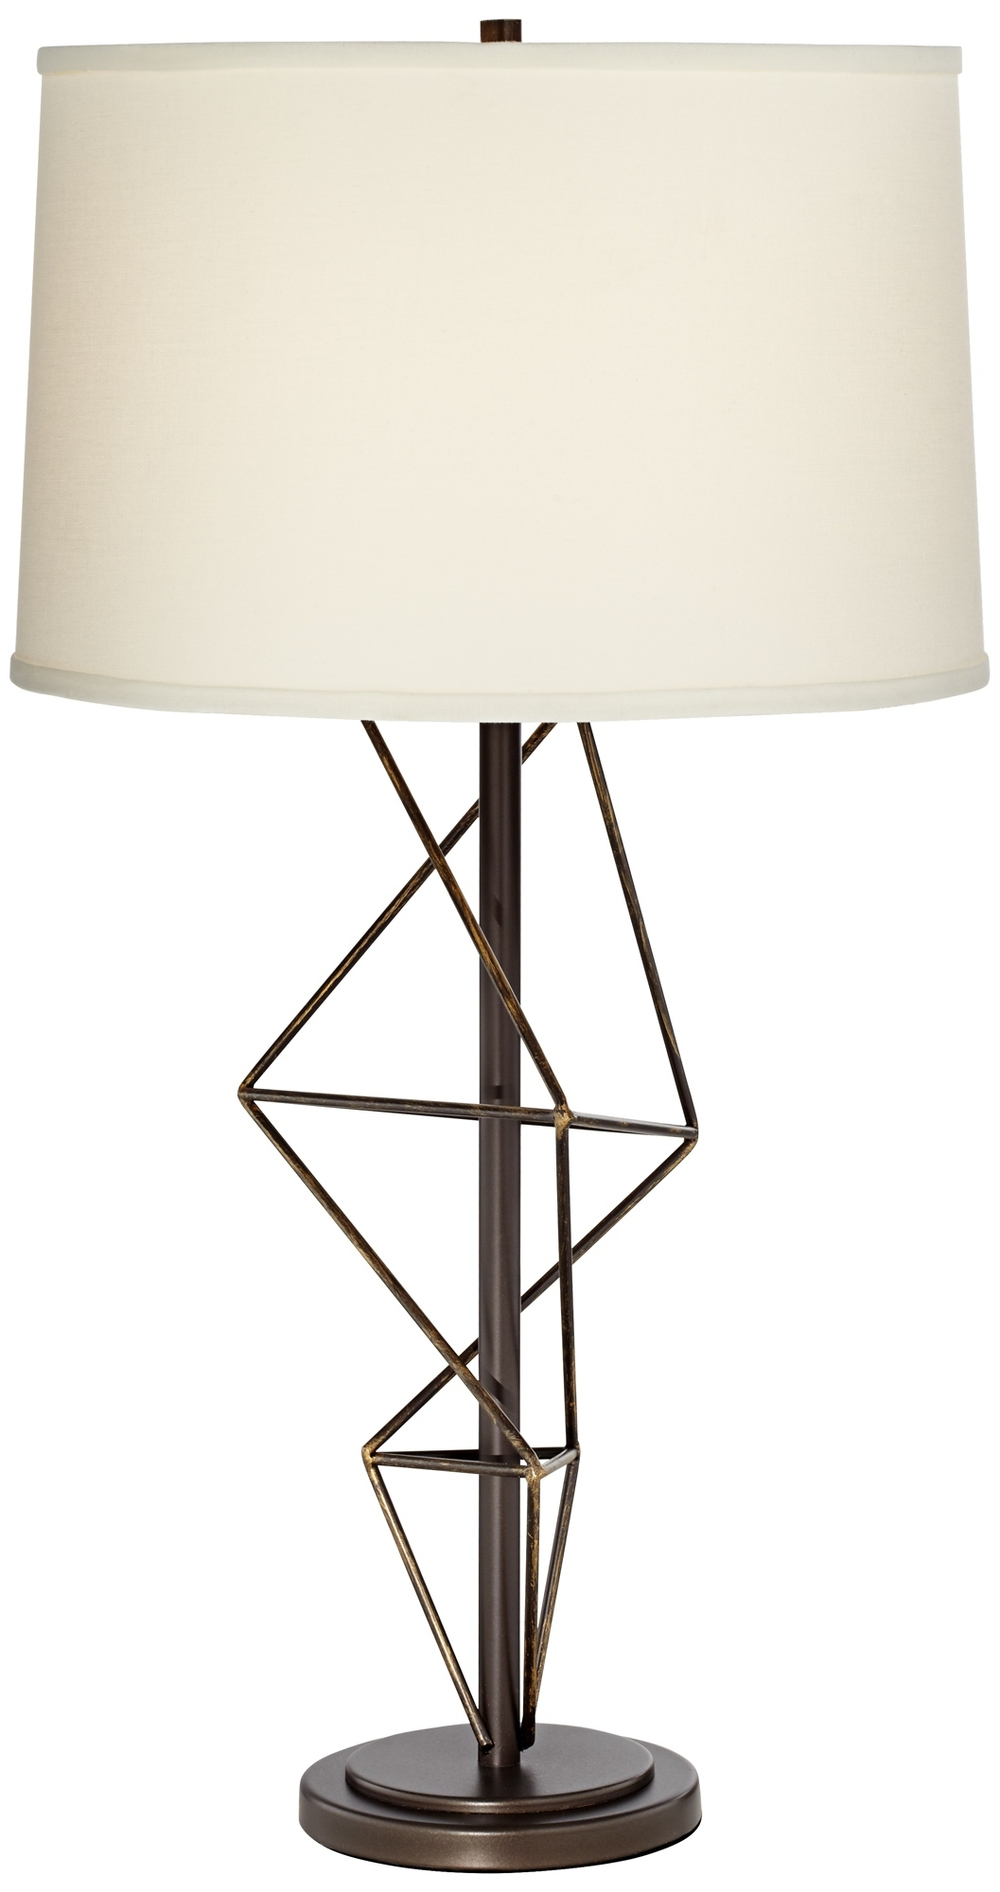 Pacific Coast Lighting - Geometric Metal Table Lamp